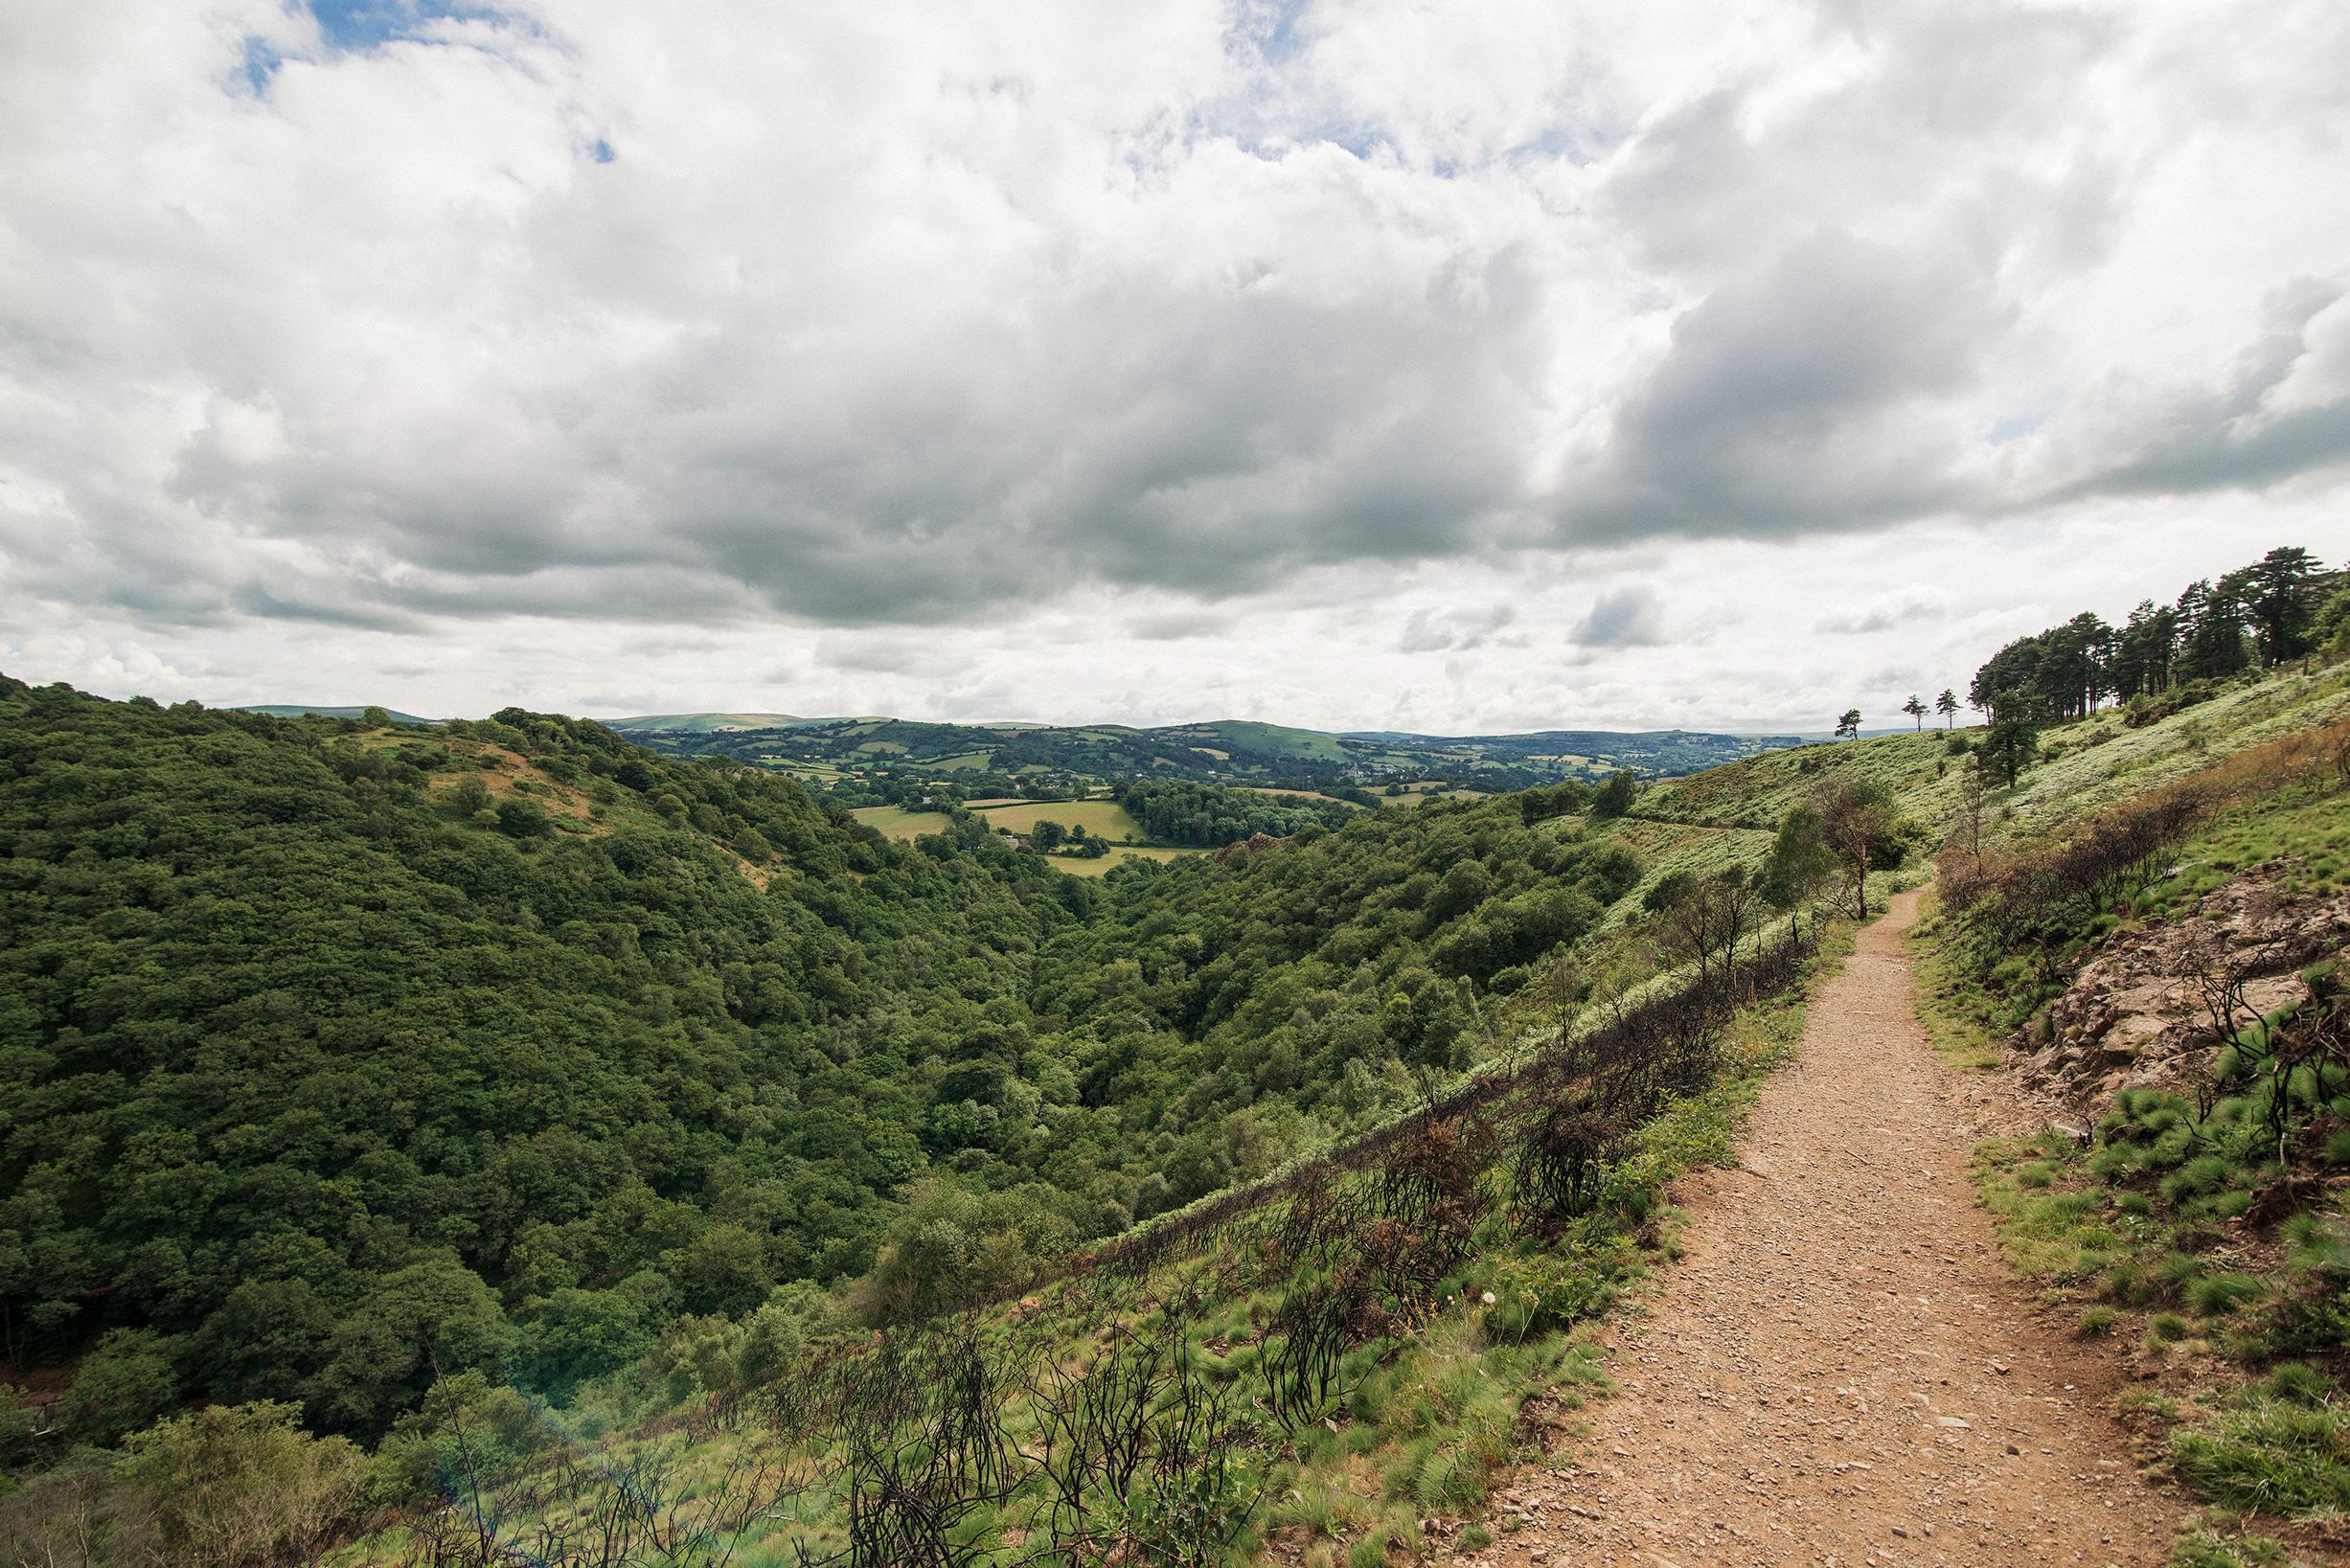 Hiking The English Countryside